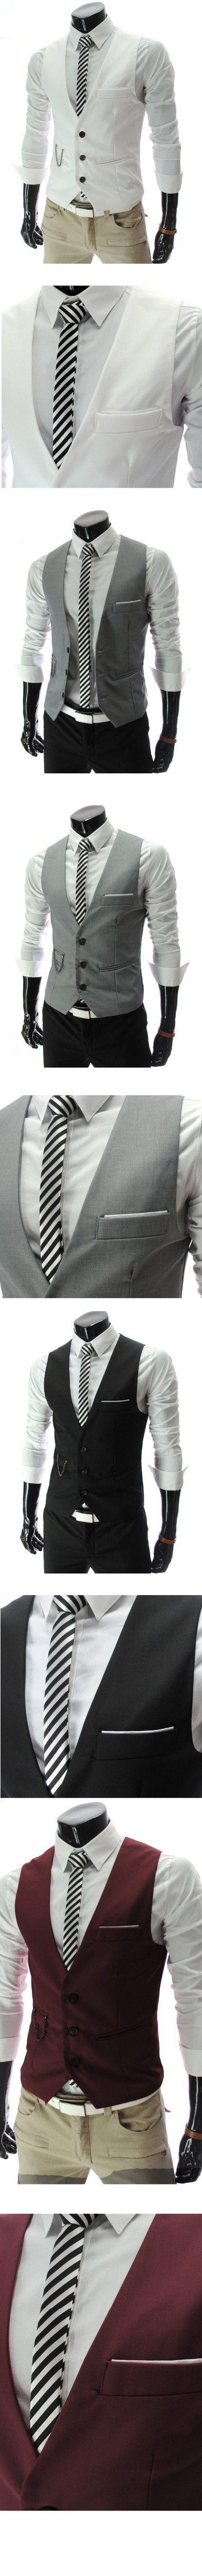 Buy Men's Vests Suit Vest Gilet Homme Business Jacket Vest Dress Vests For Men Slim Fit Mens Suit Vest now. Sale. 1-3CM Error is allowed Slight color difference is allowed for different computer display